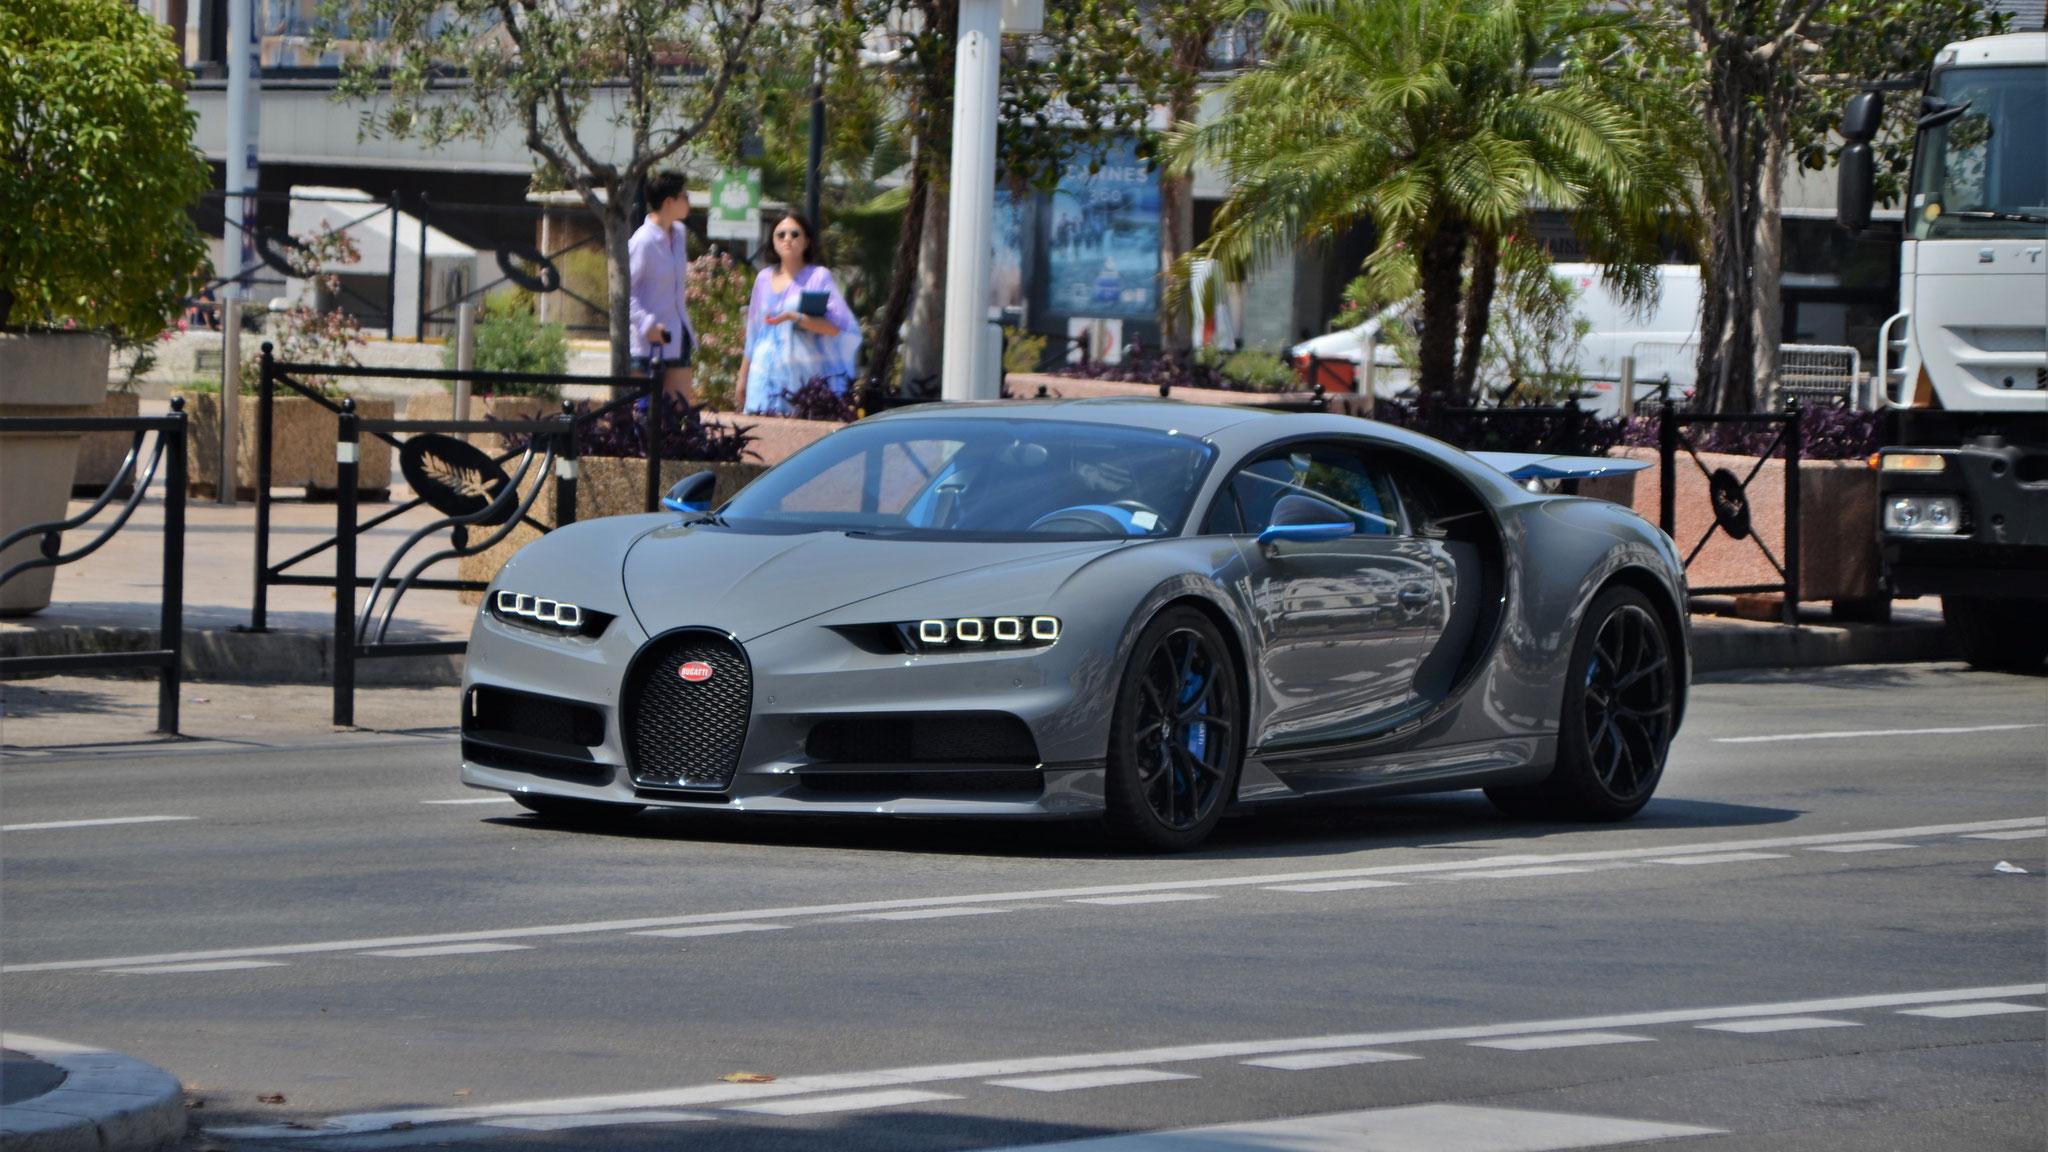 Bugatti Chiron - KALIFA (USA)